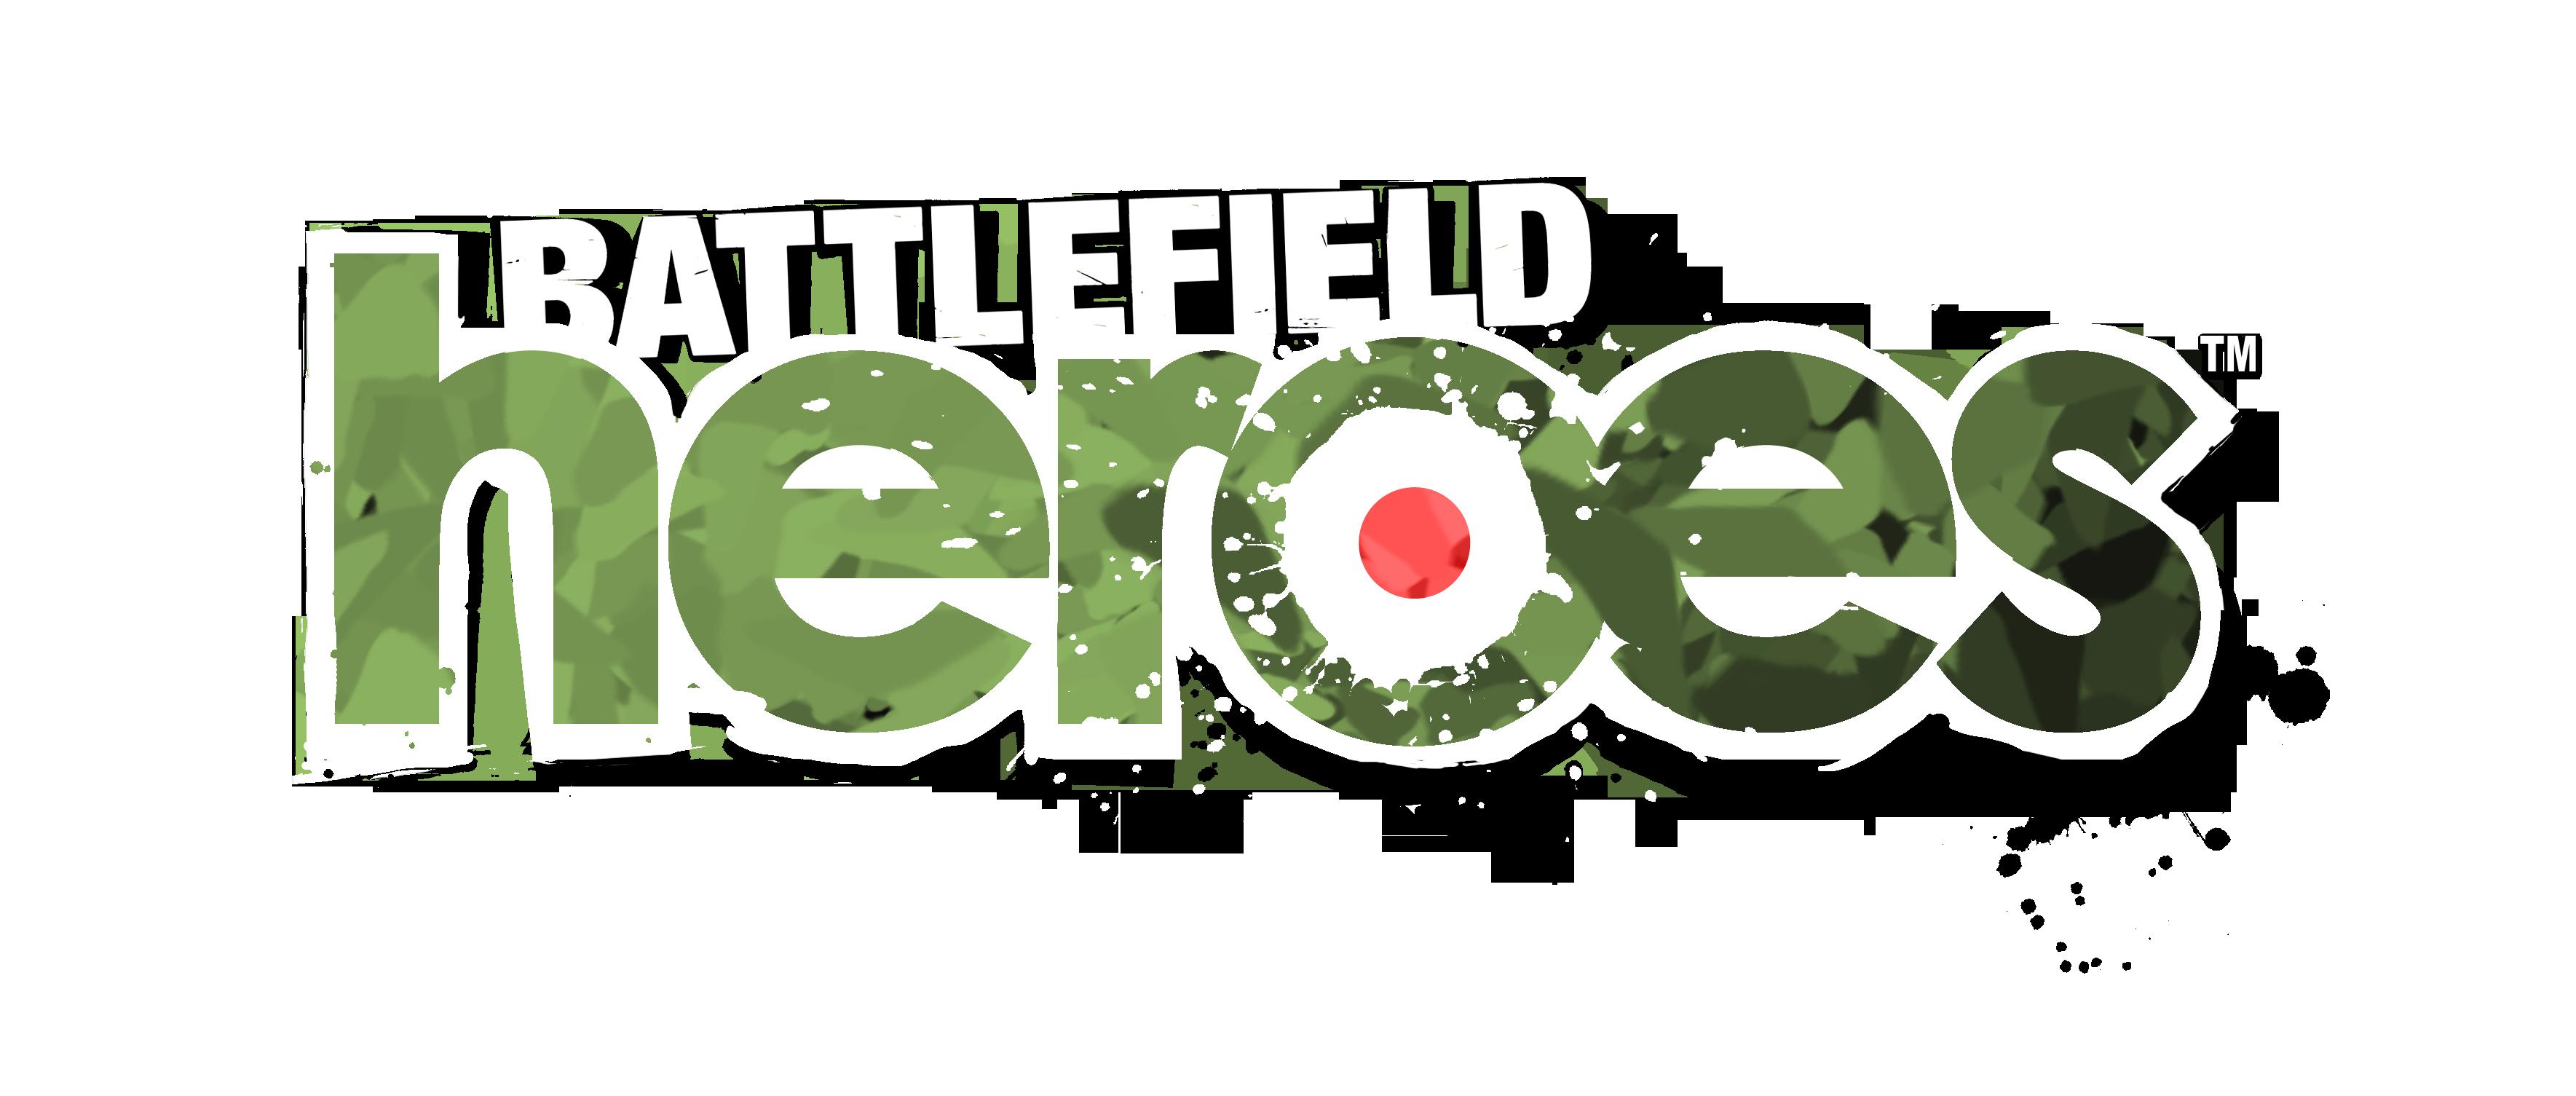 Battlefield Vietnam Logo Gif 392 143